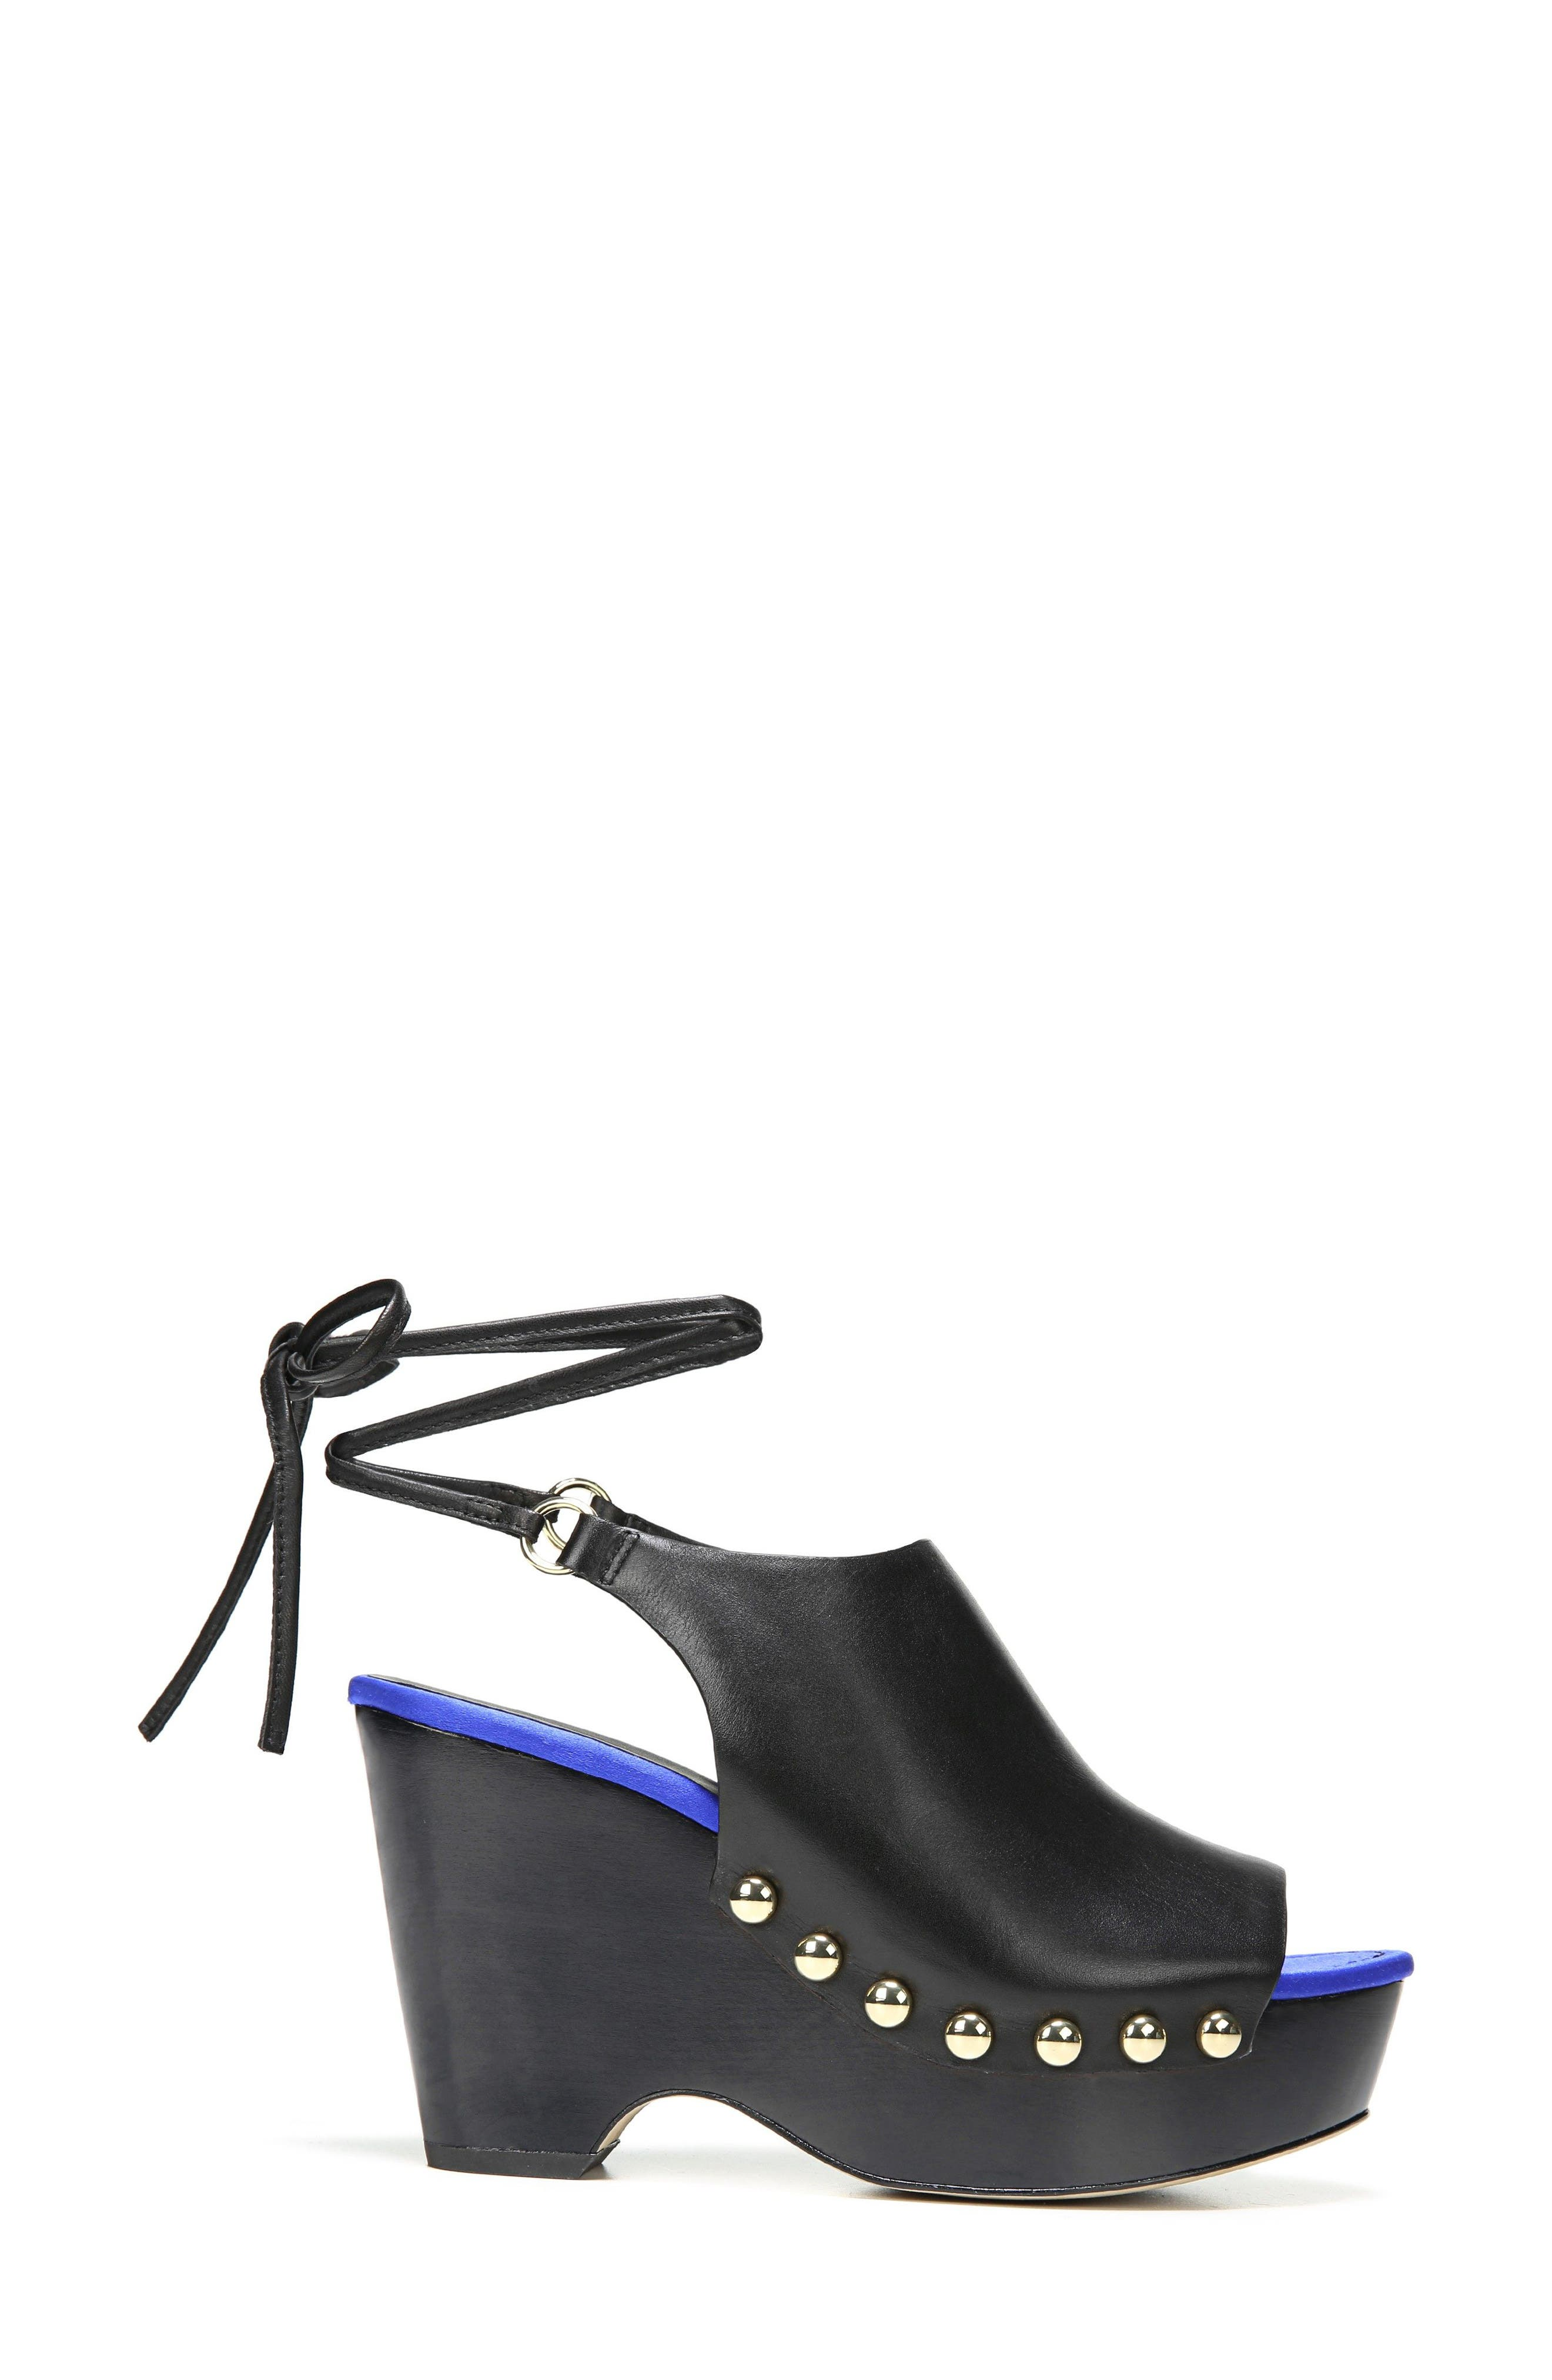 Alternate Image 3  - Diane Von Furstenberg Bali Wedge Sandal (Women)